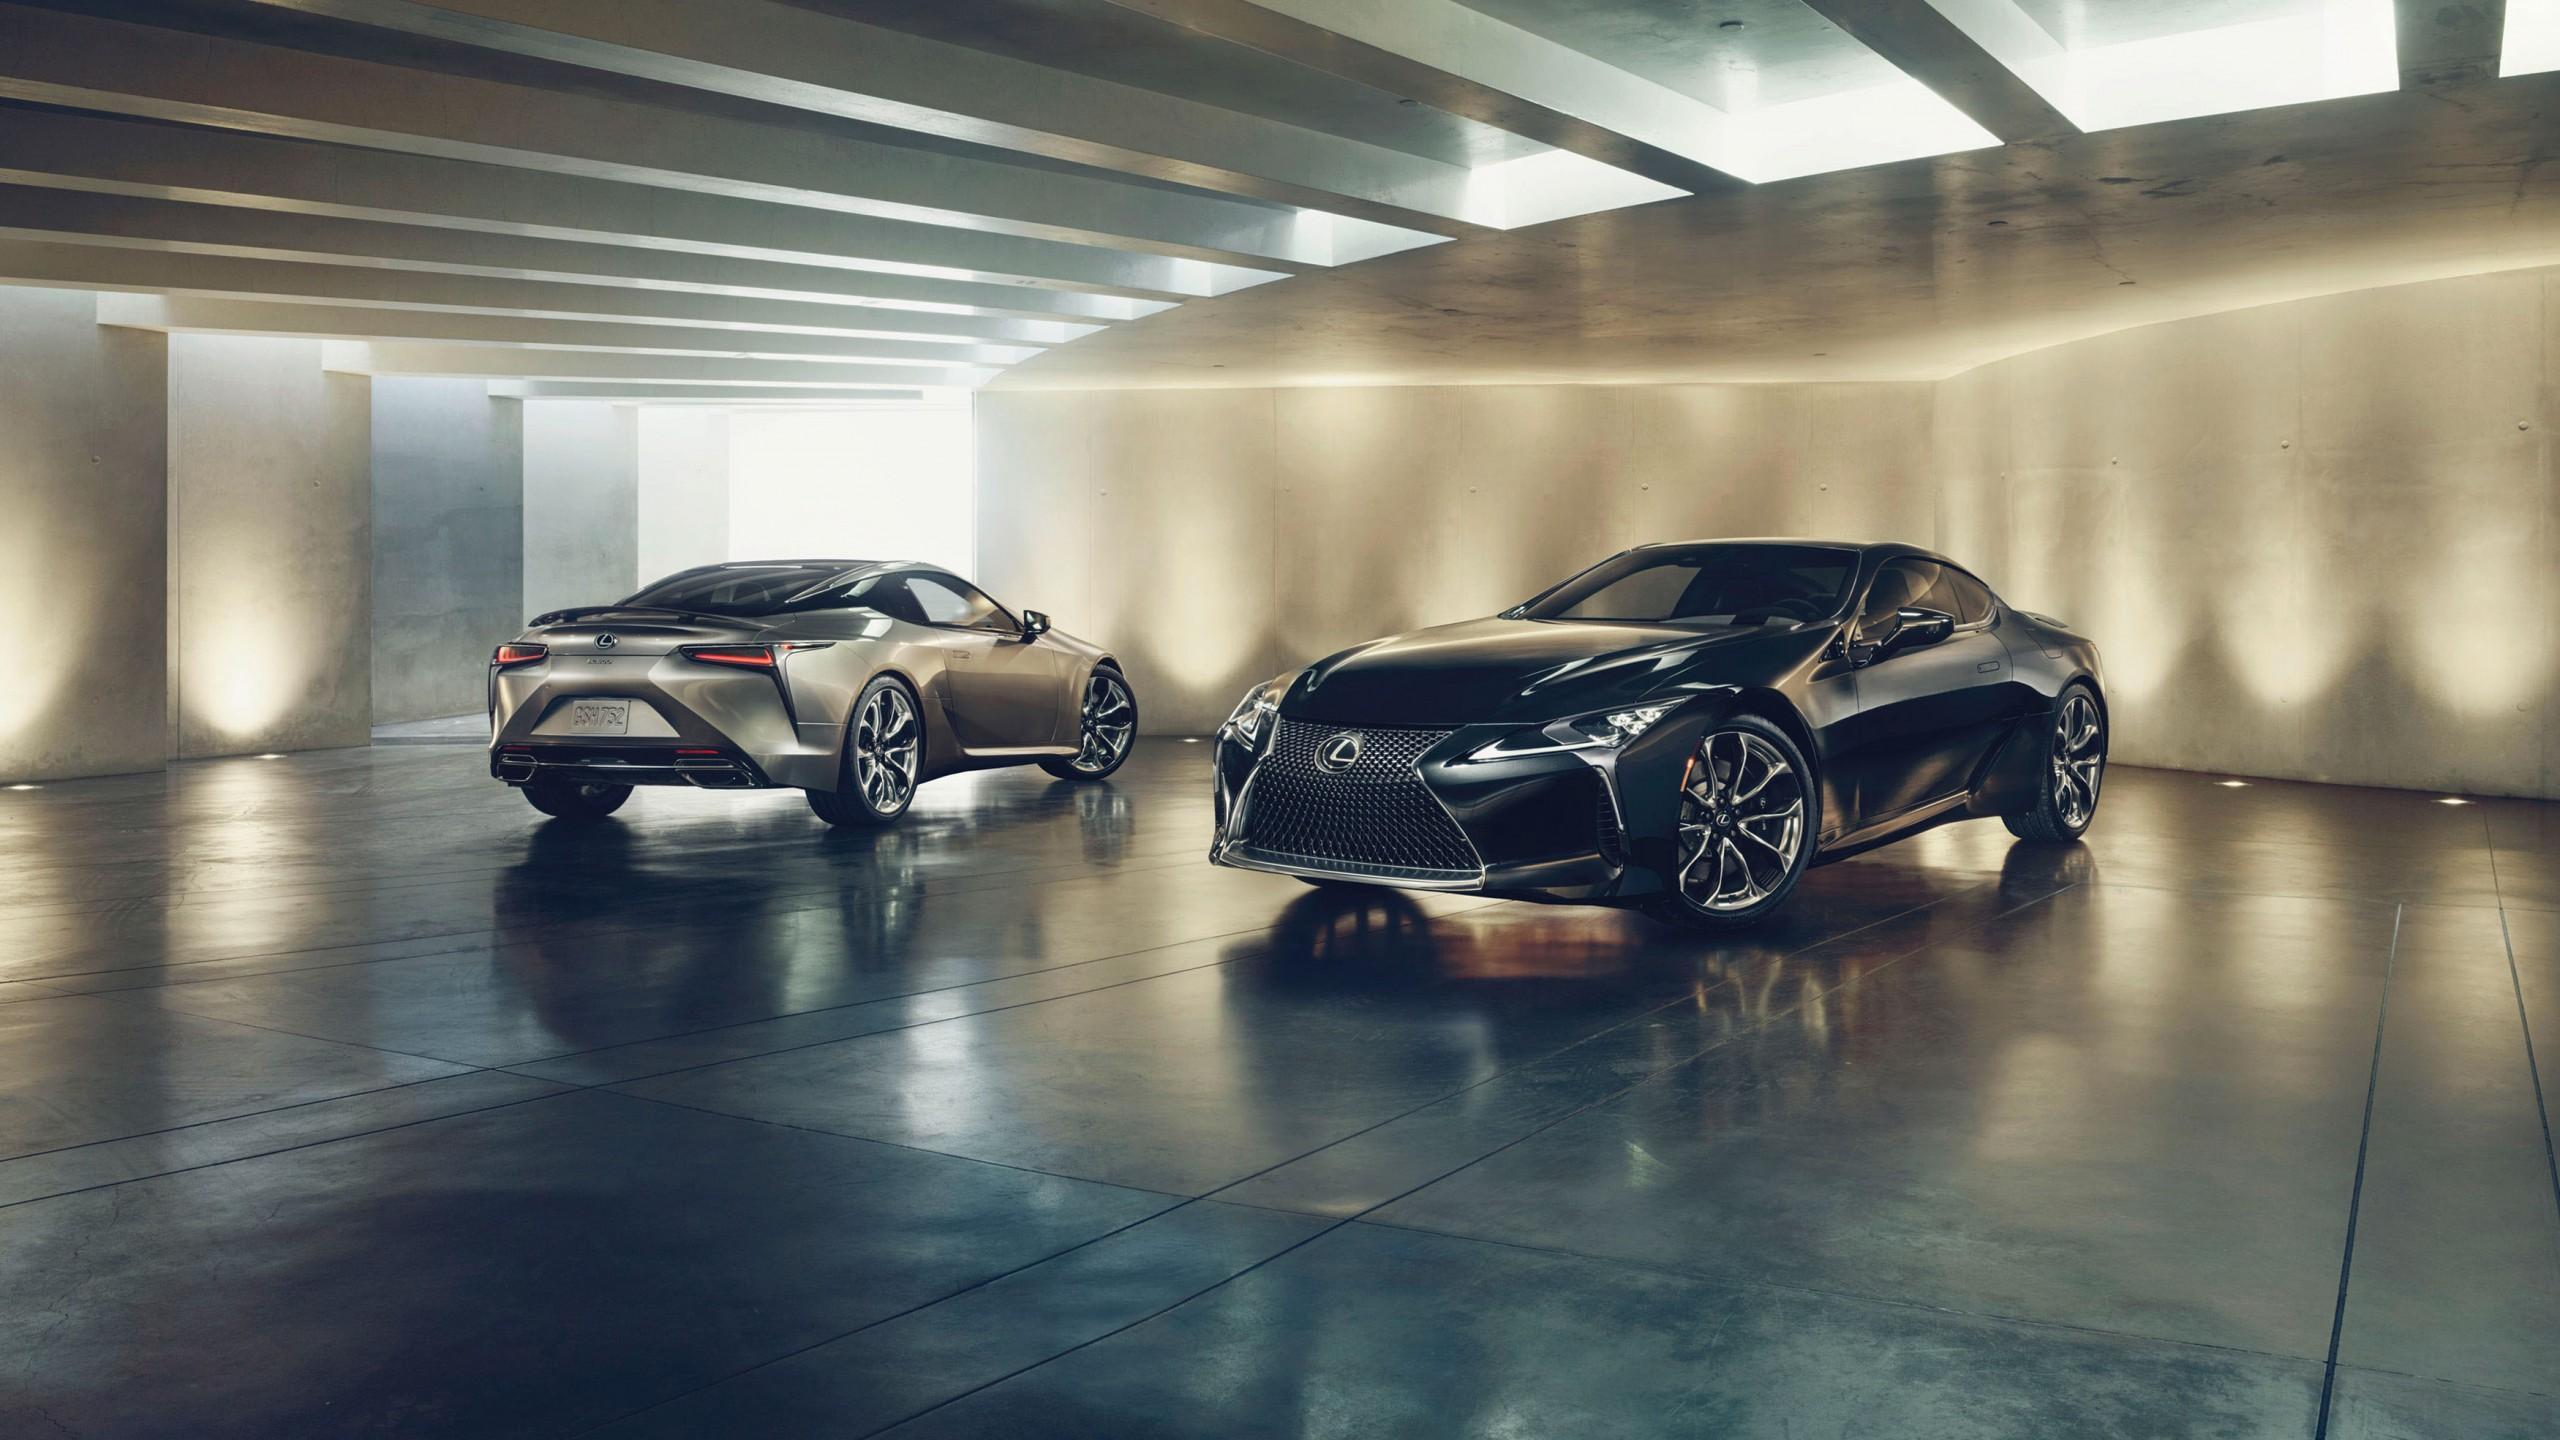 Lexus Es 350 2019 >> 2018 Lexus LC 500 10 Wallpaper | HD Car Wallpapers | ID #8054